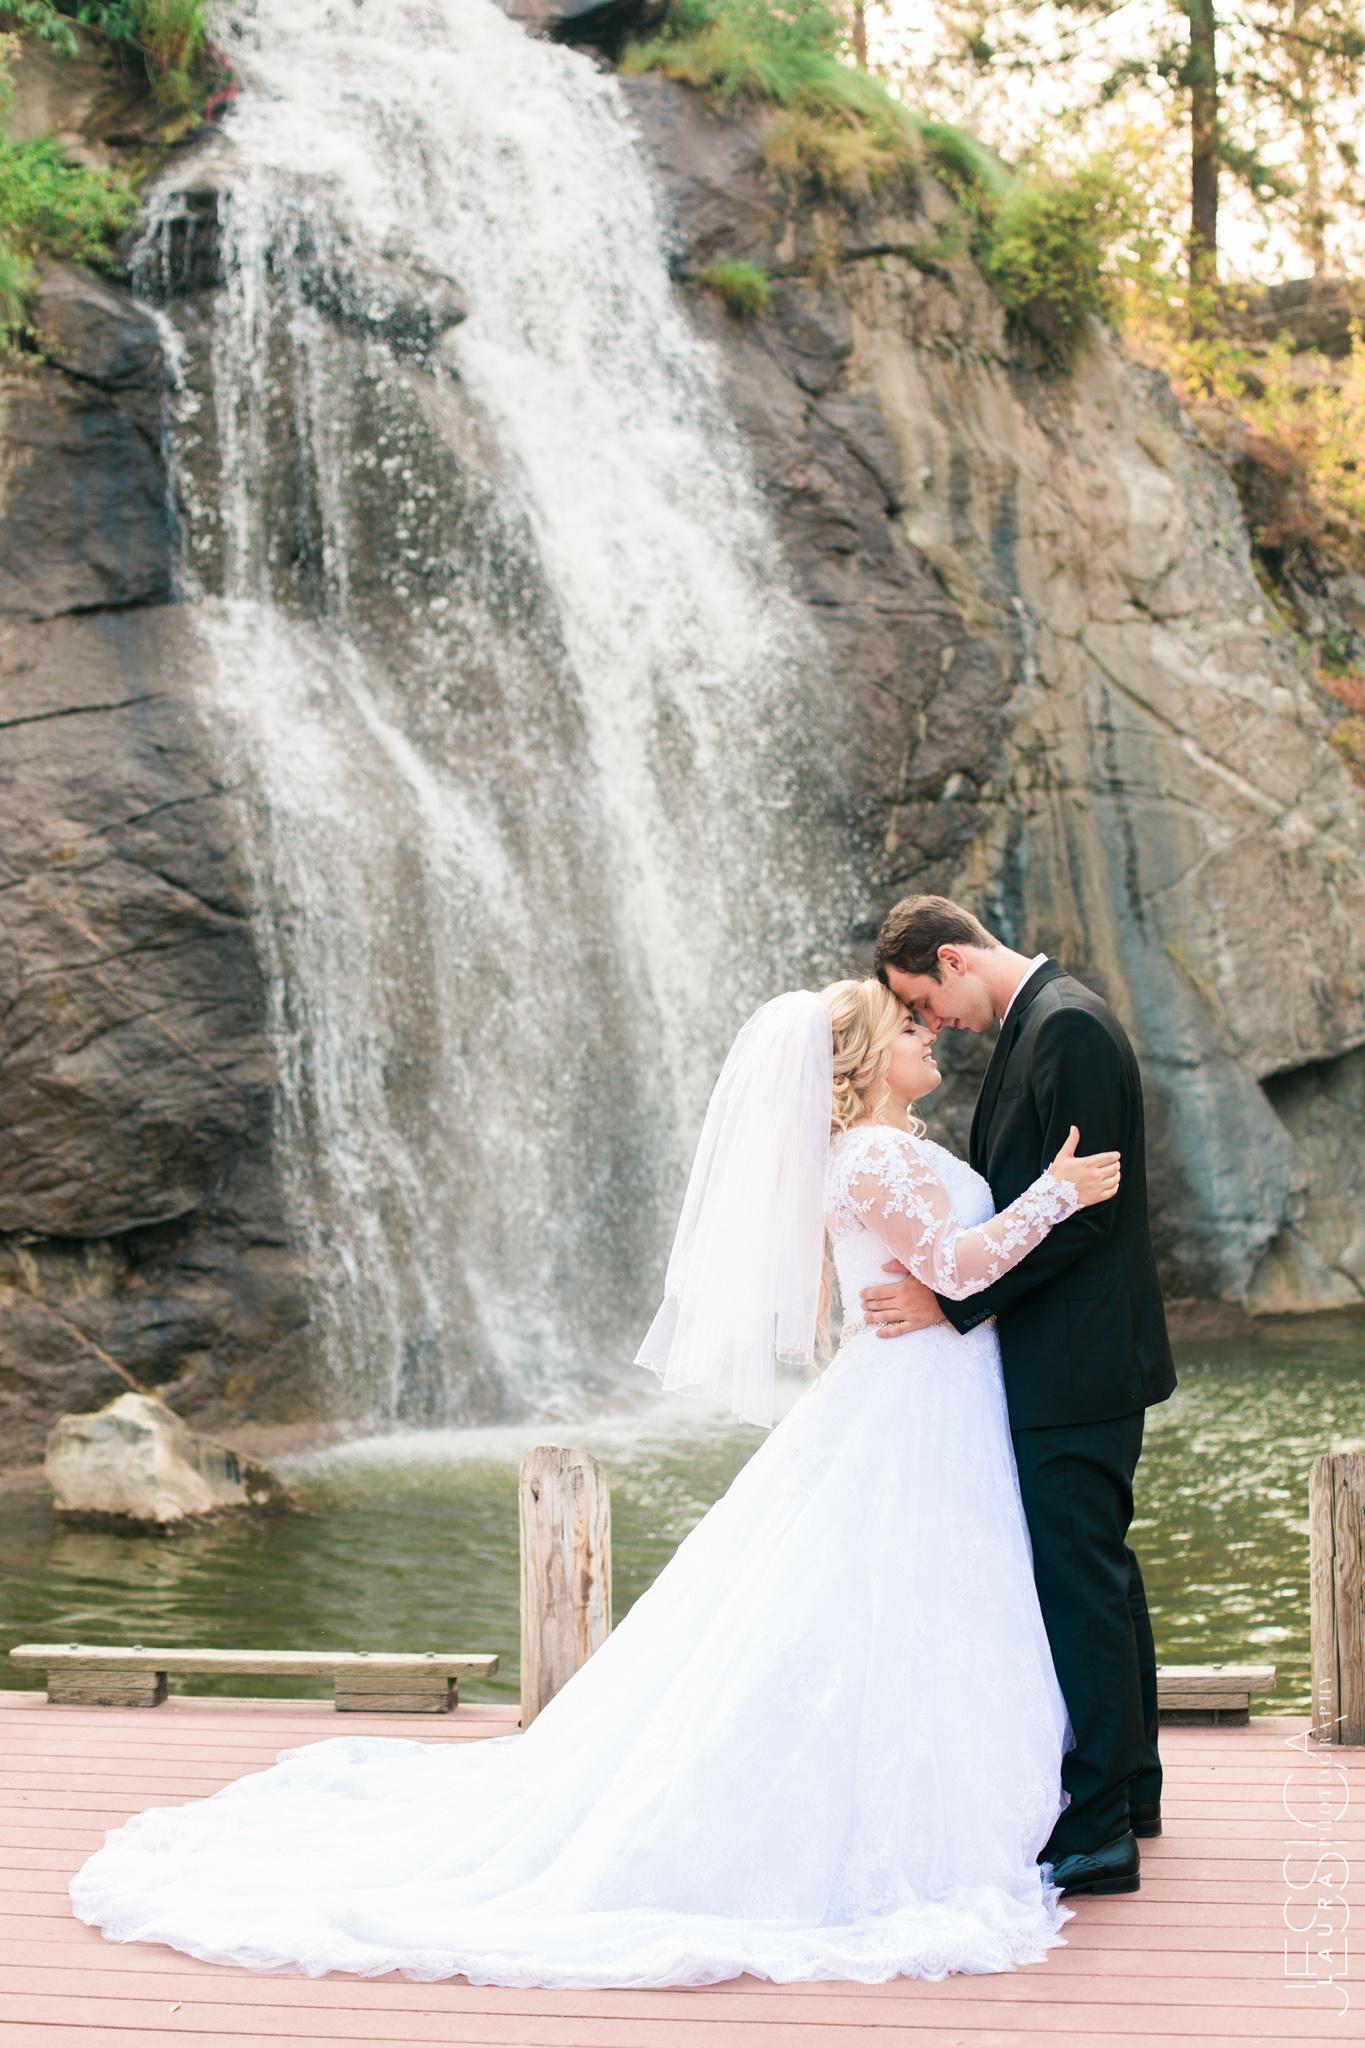 Eugene-Maryana_wedding_08062017_web (534 of 558).JPG